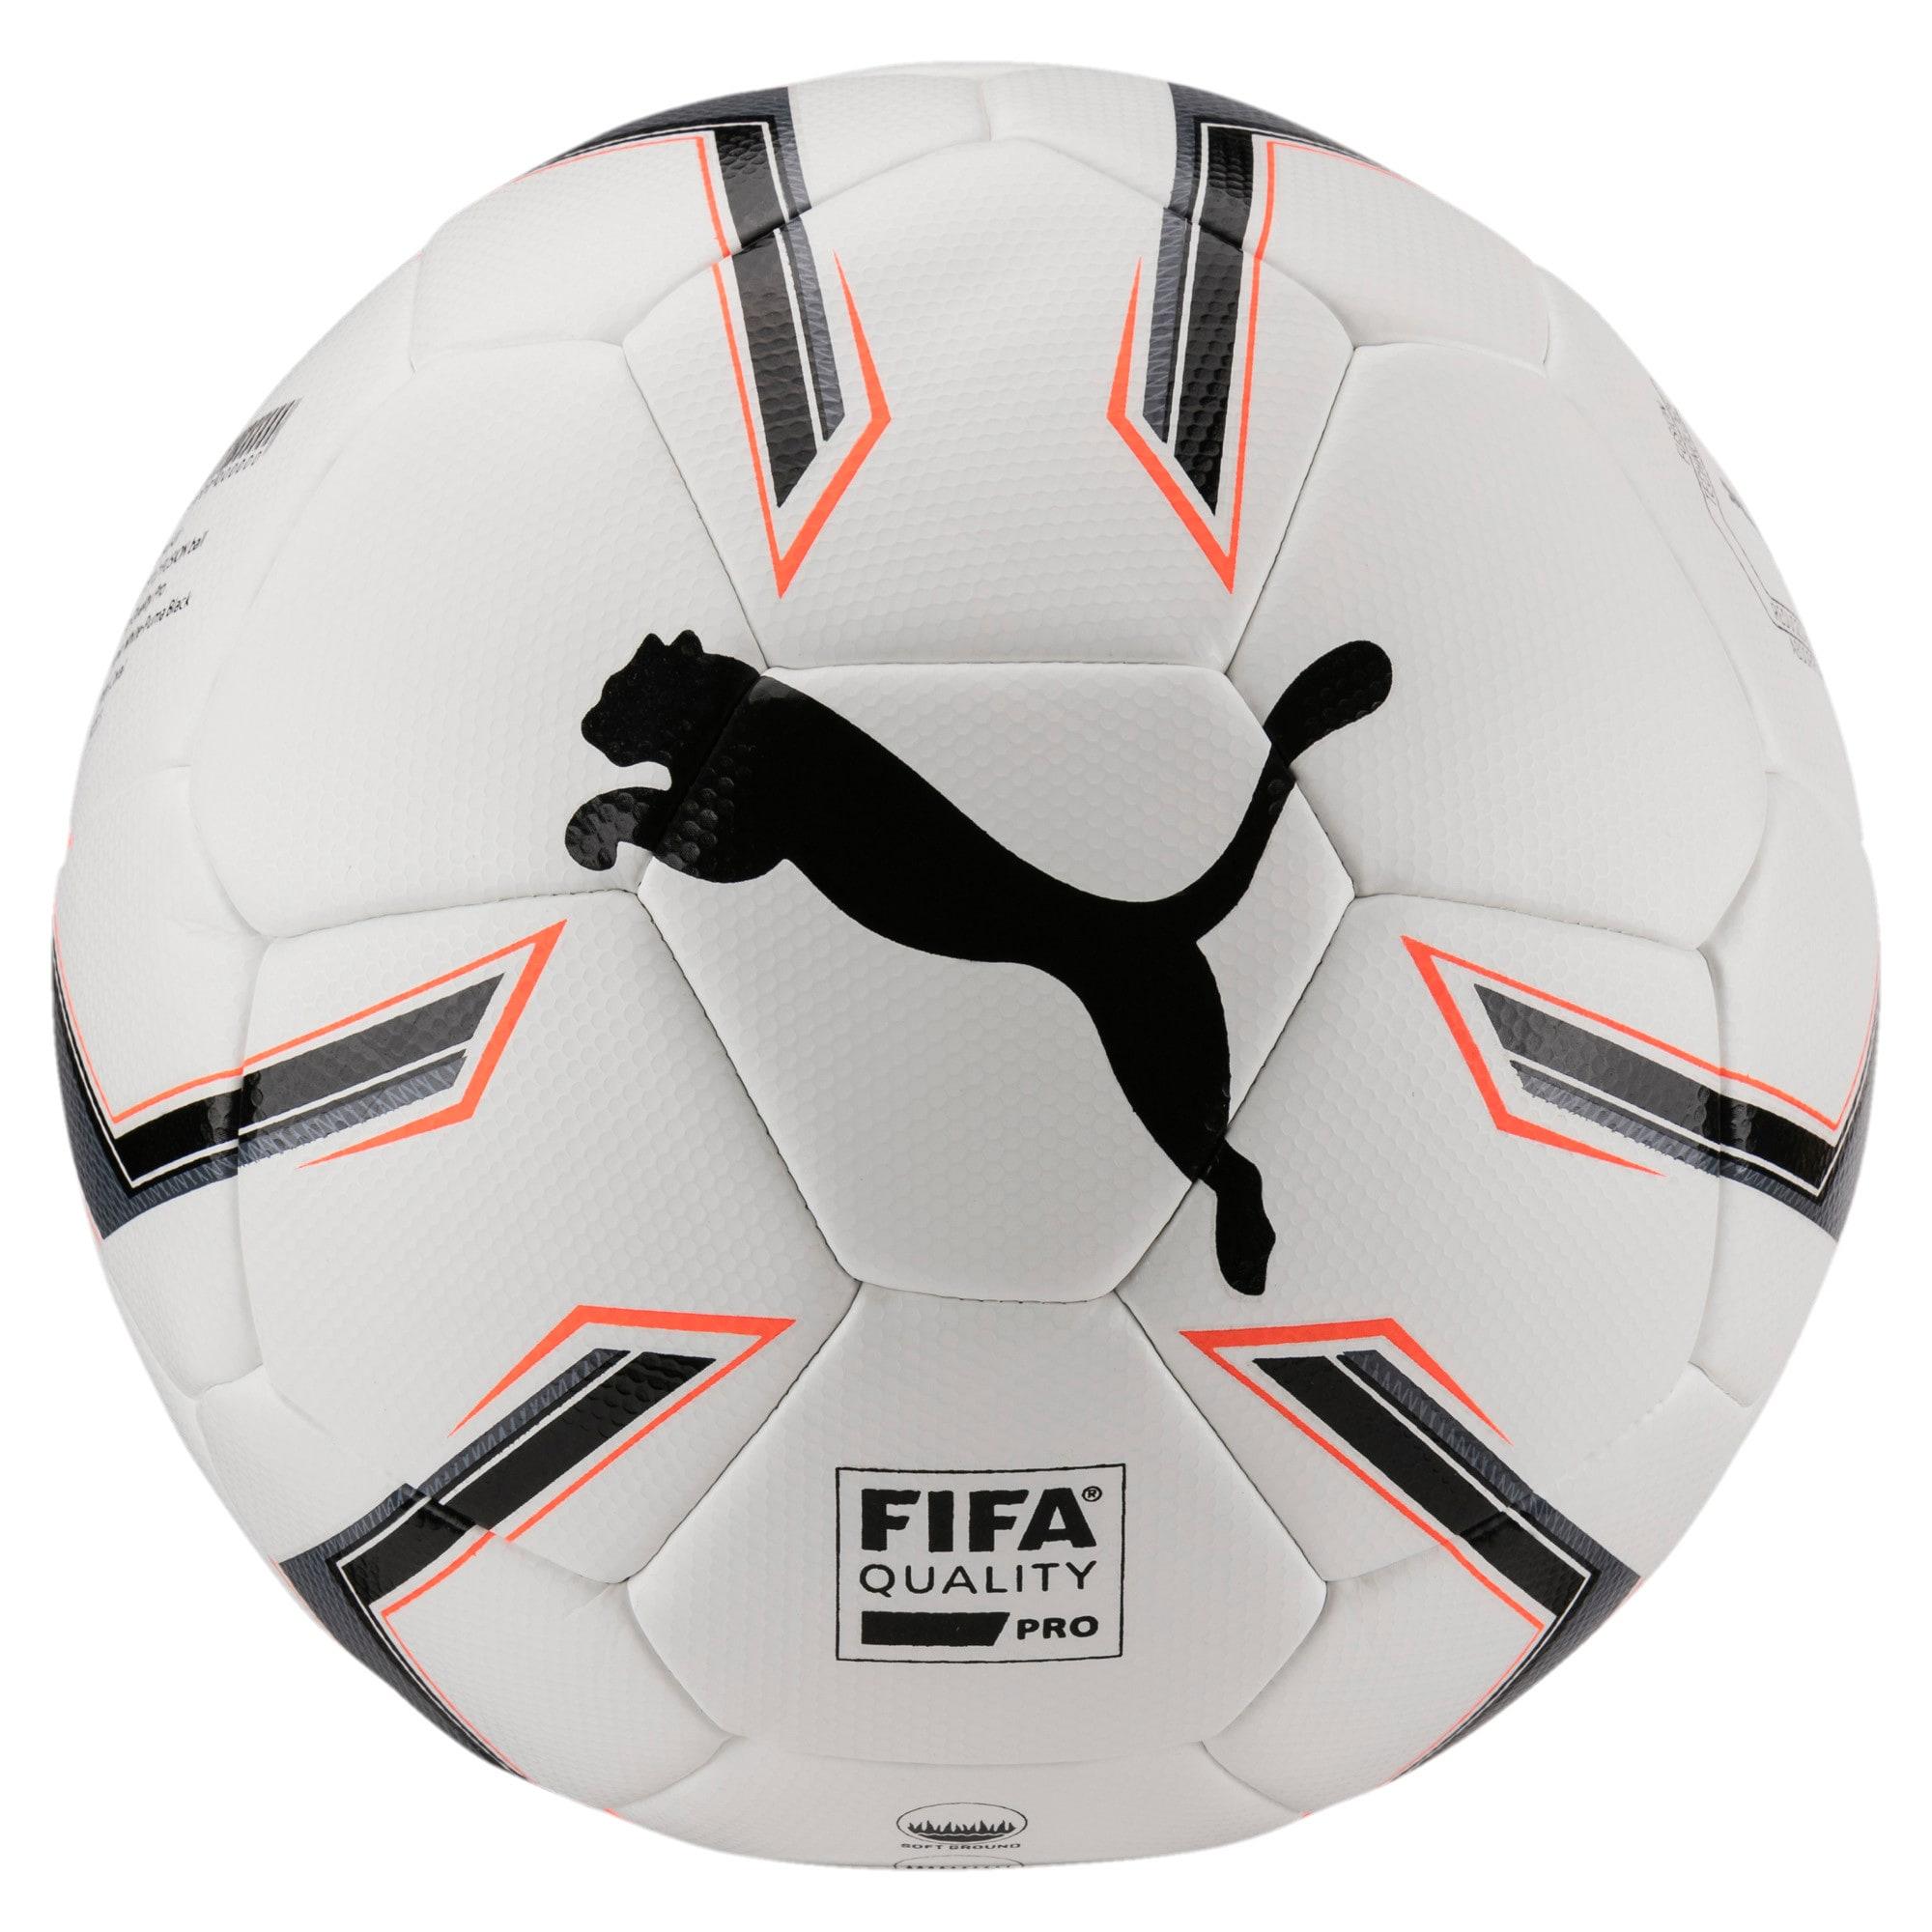 Thumbnail 1 of ELITE 1.2 FUSION Pro Soccer Ball, White-Black-Fiery Coral, medium